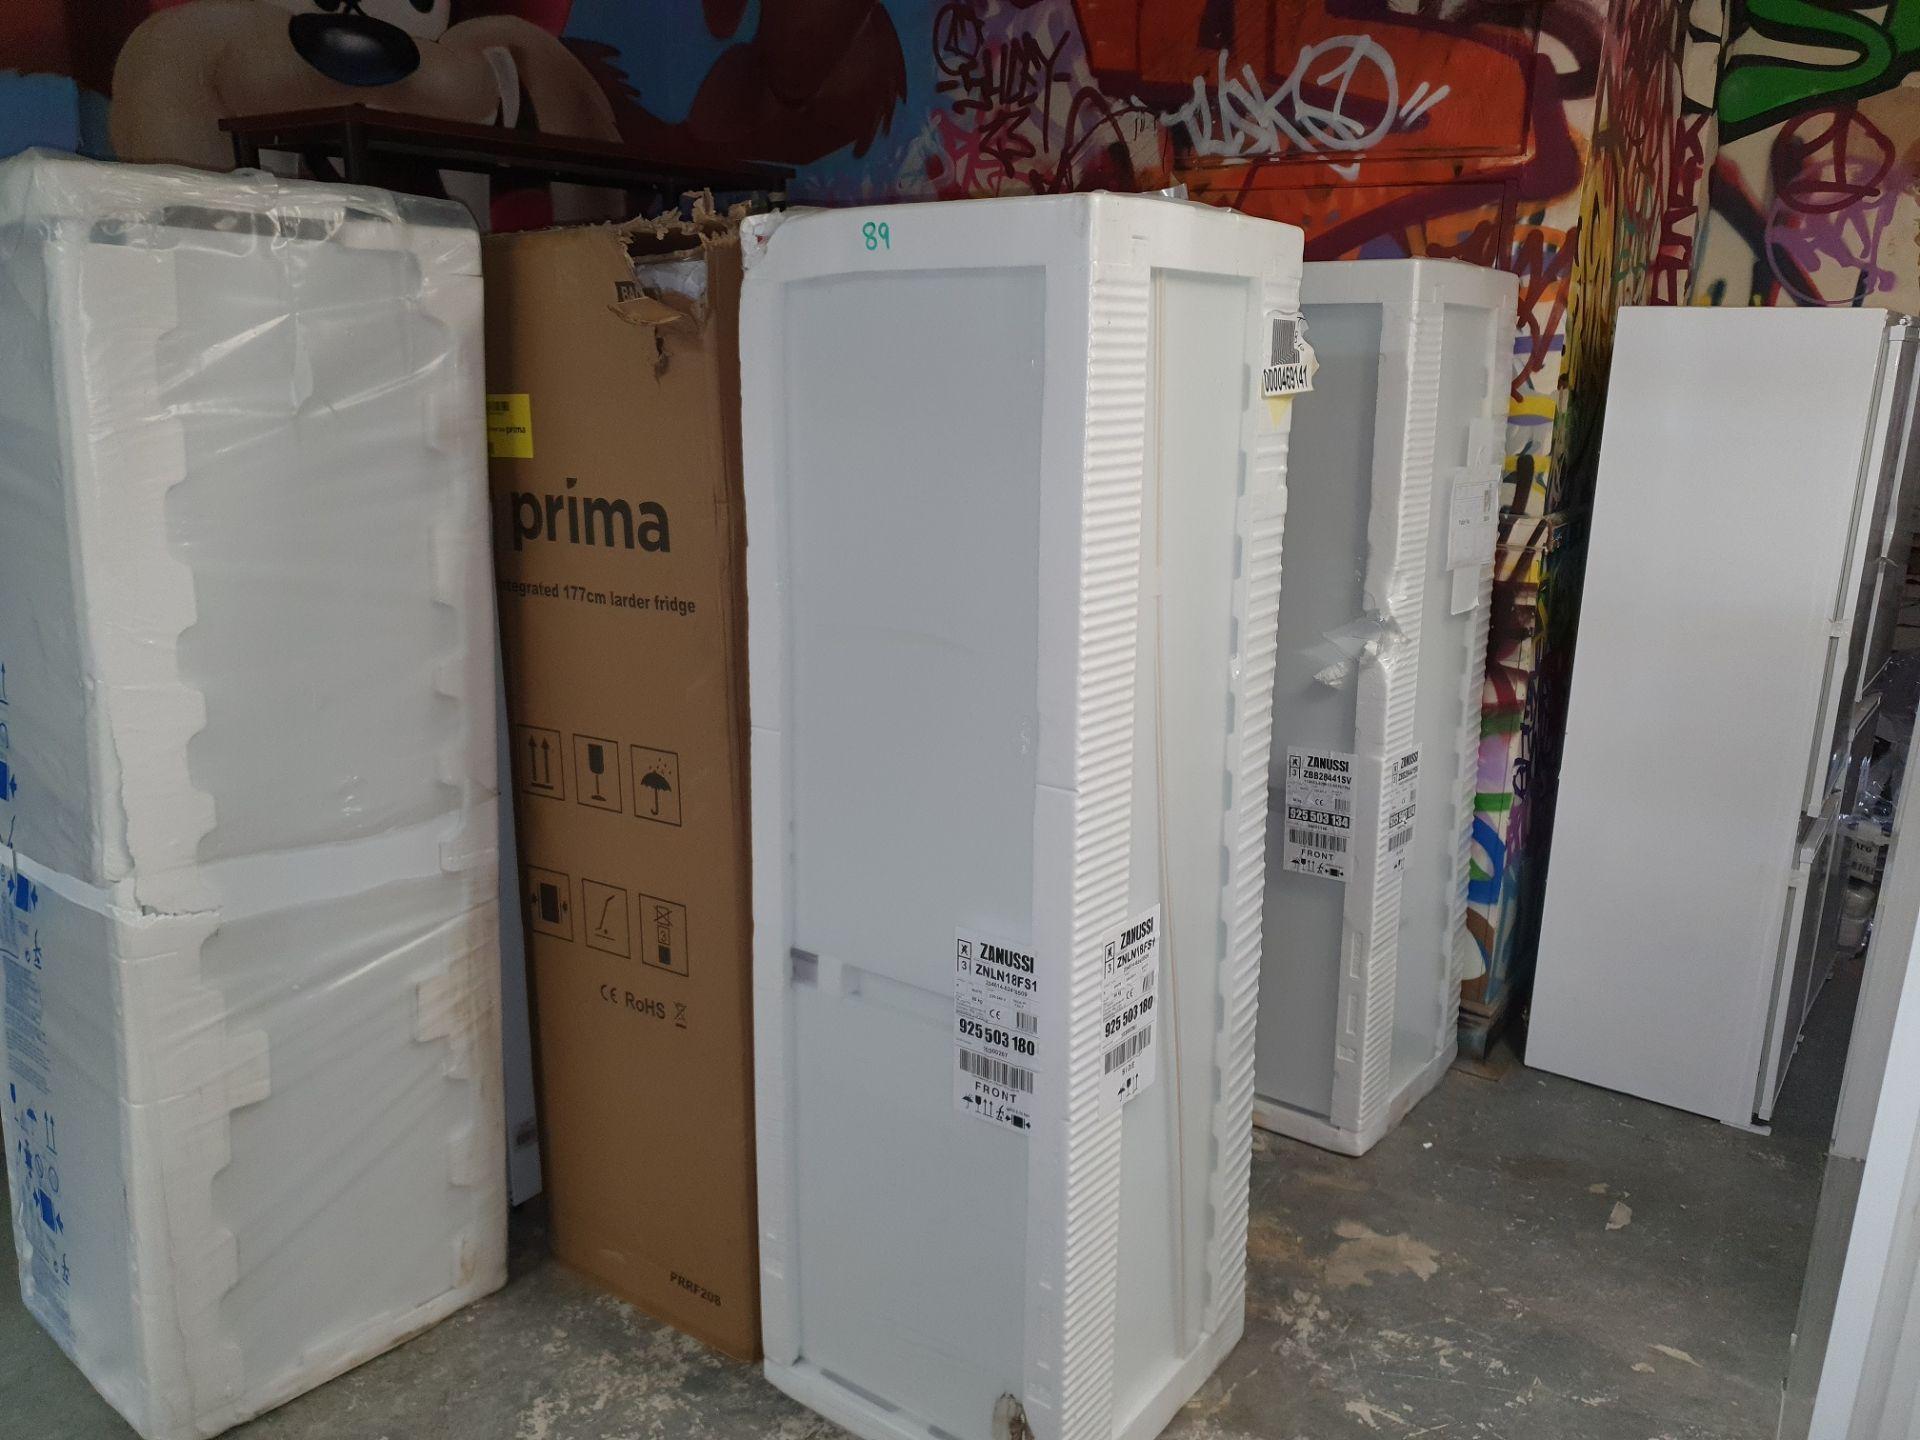 NEW/GRADED AND UNPACKAGED Prima PRRF702 Integrated Fridge Freezer (Brand new slight external - Image 3 of 14